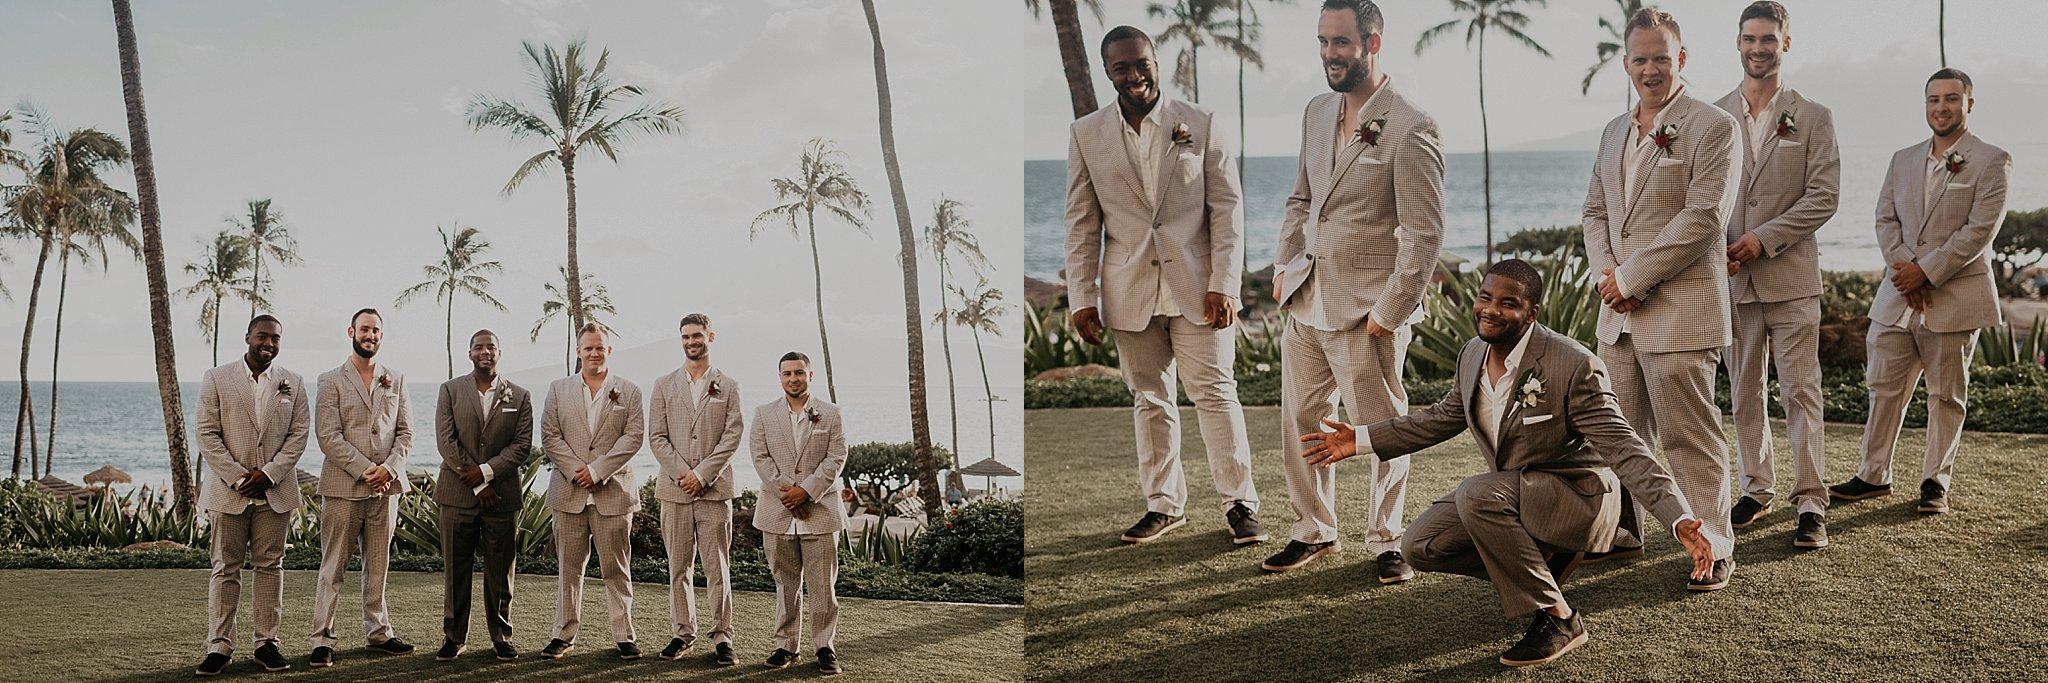 samantha_mcfarlen_bellingham_washington_engagement_photography_seattle_wedding_photographer_0224.jpg